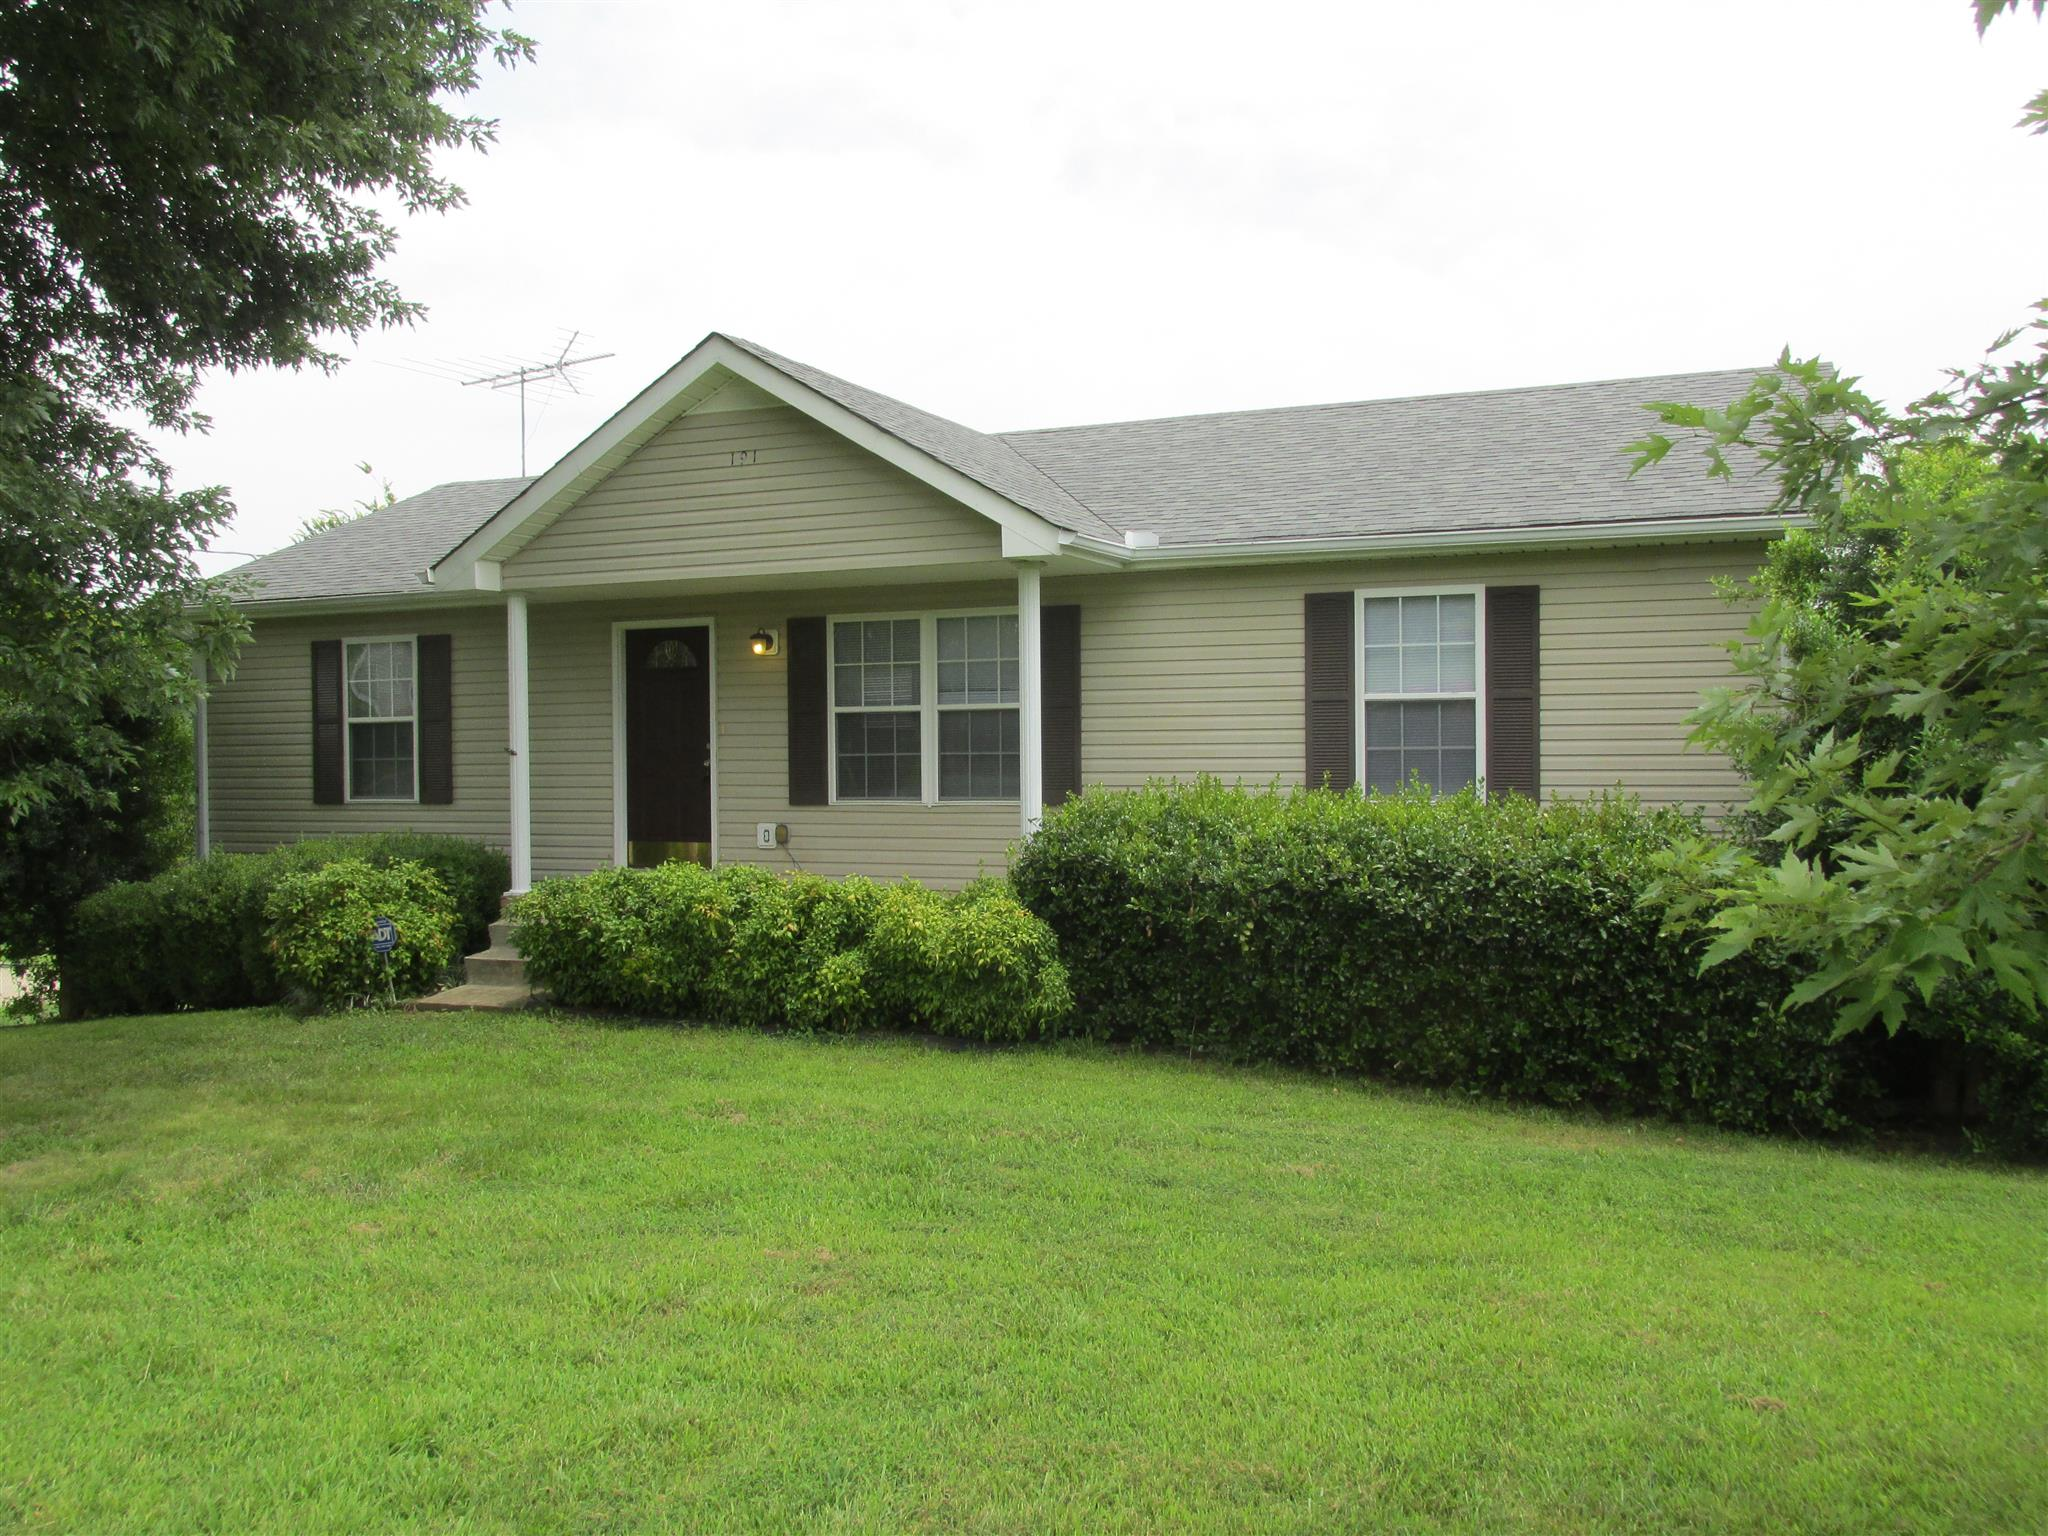 191 Cummings Creek Rd, Clarksville, TN 37042